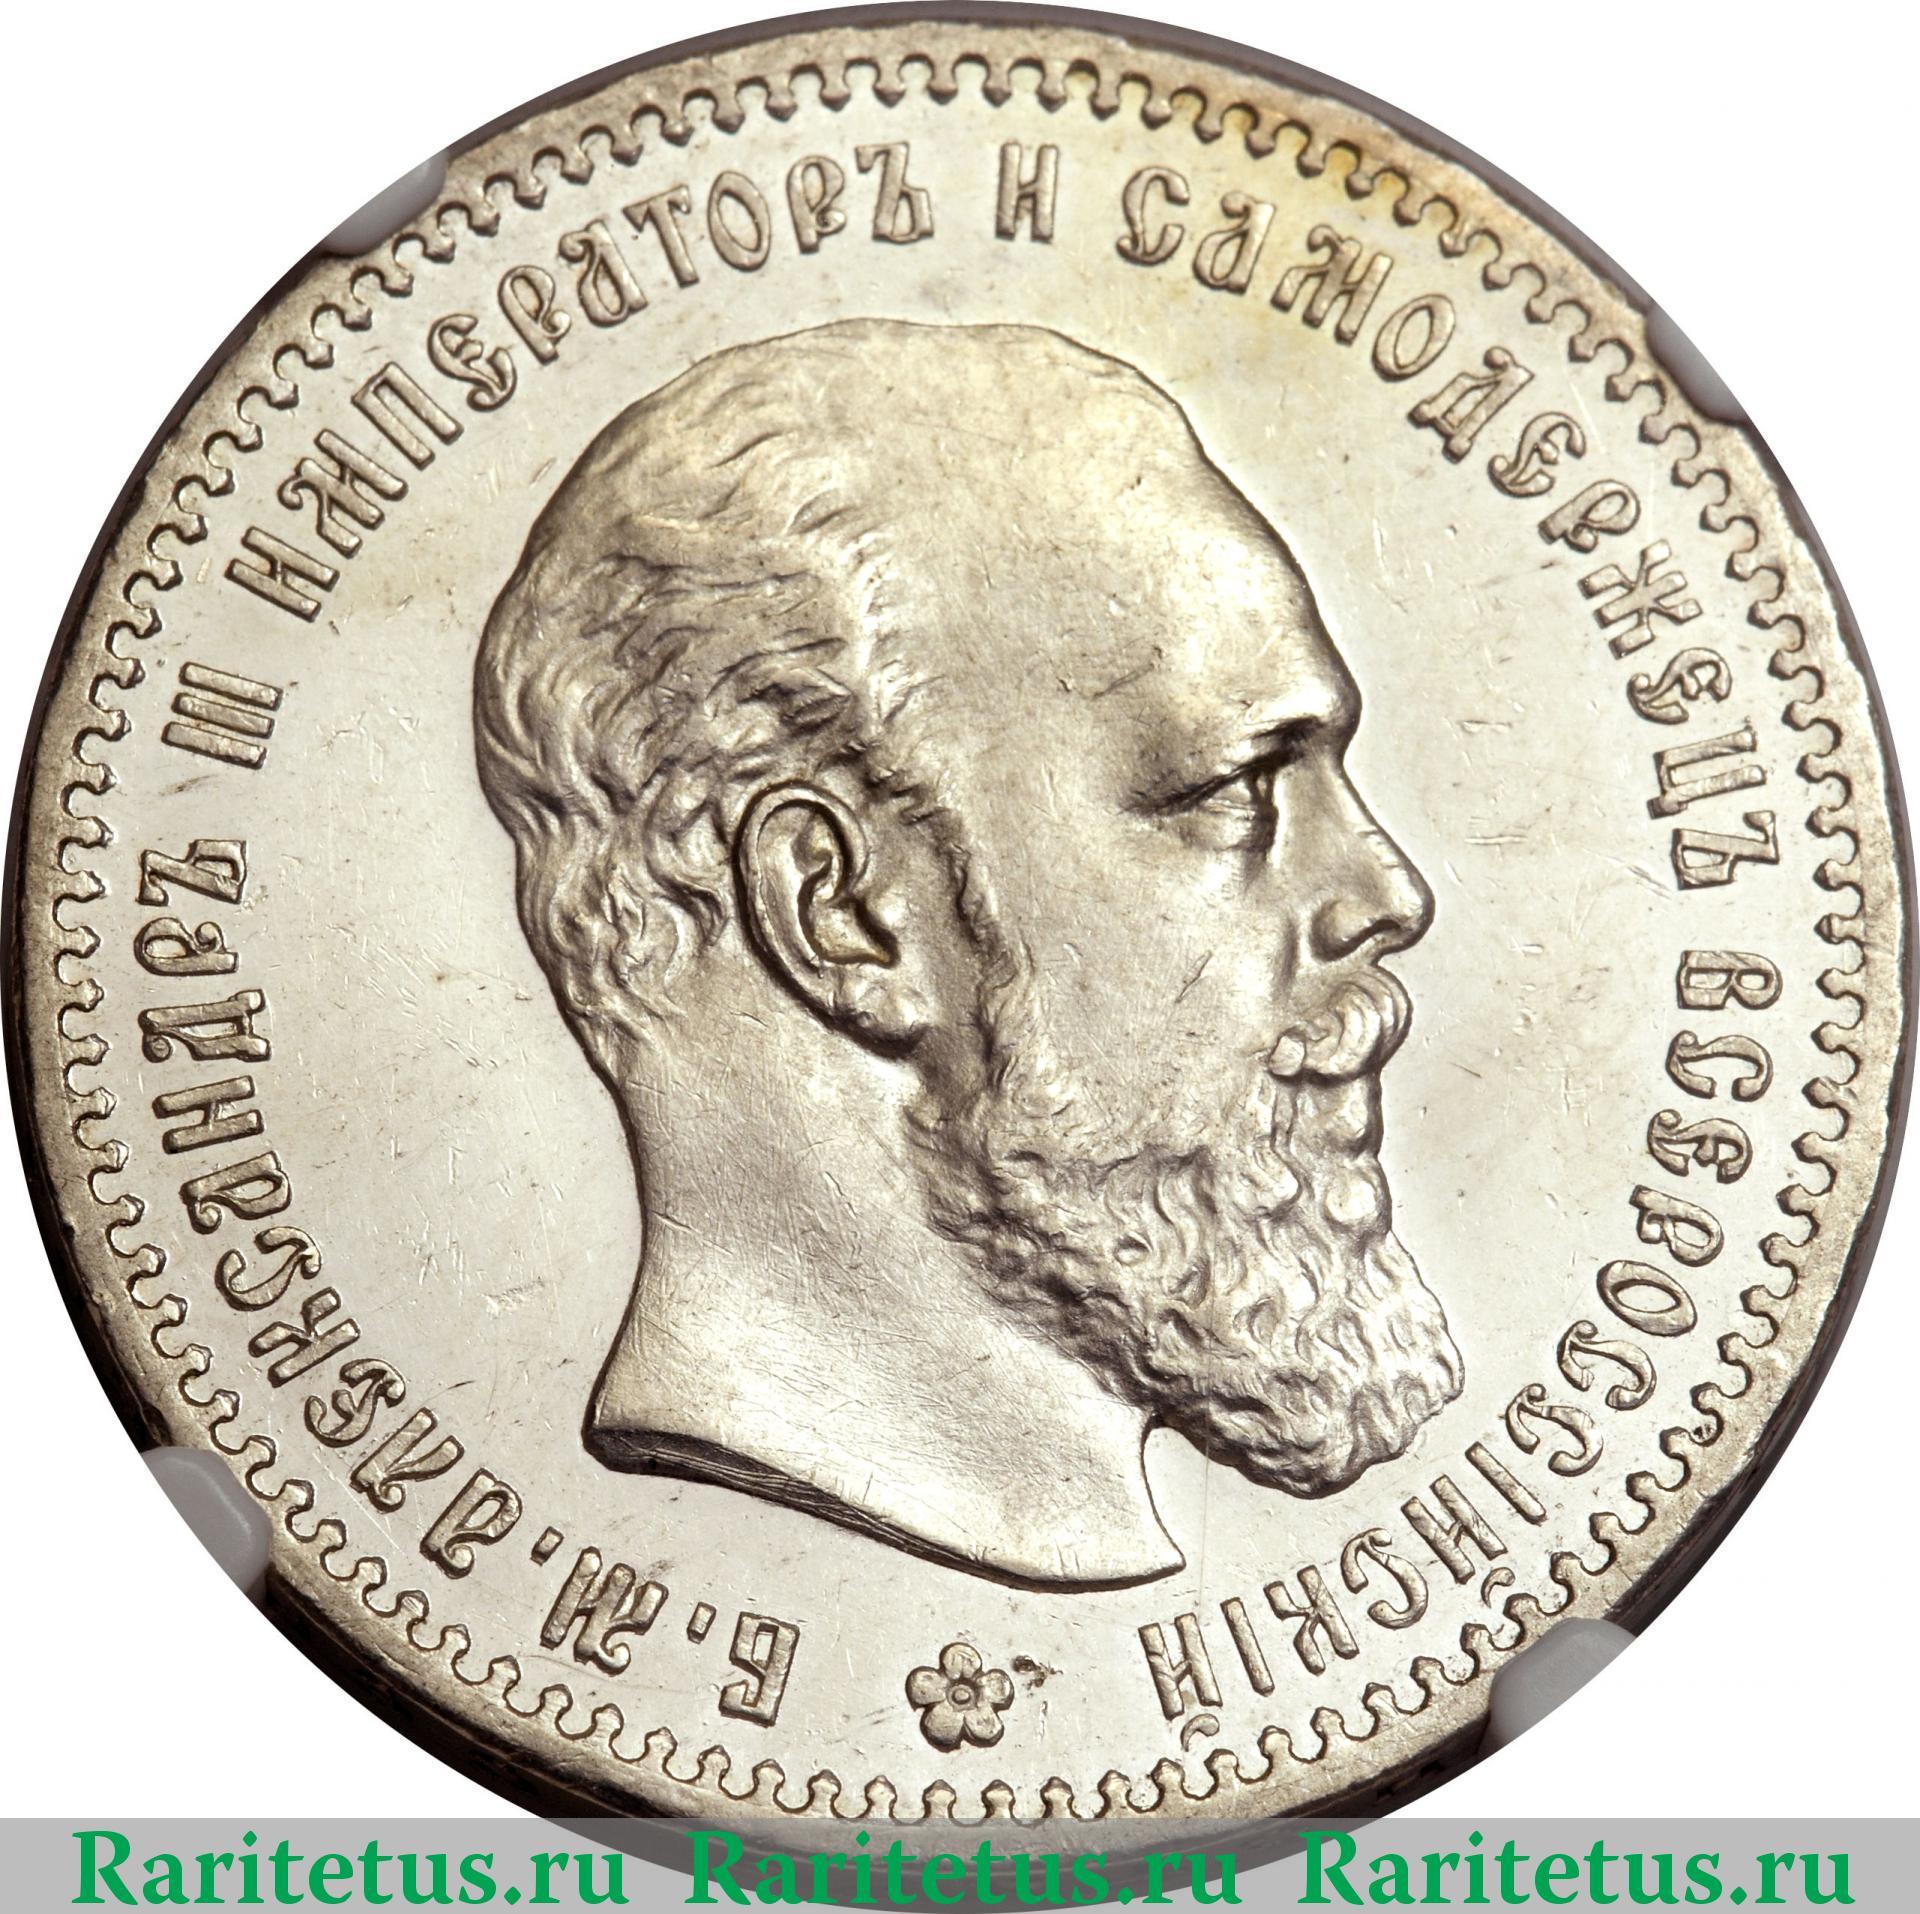 Рубли александра 3 форум монеты времен петра 1 цены